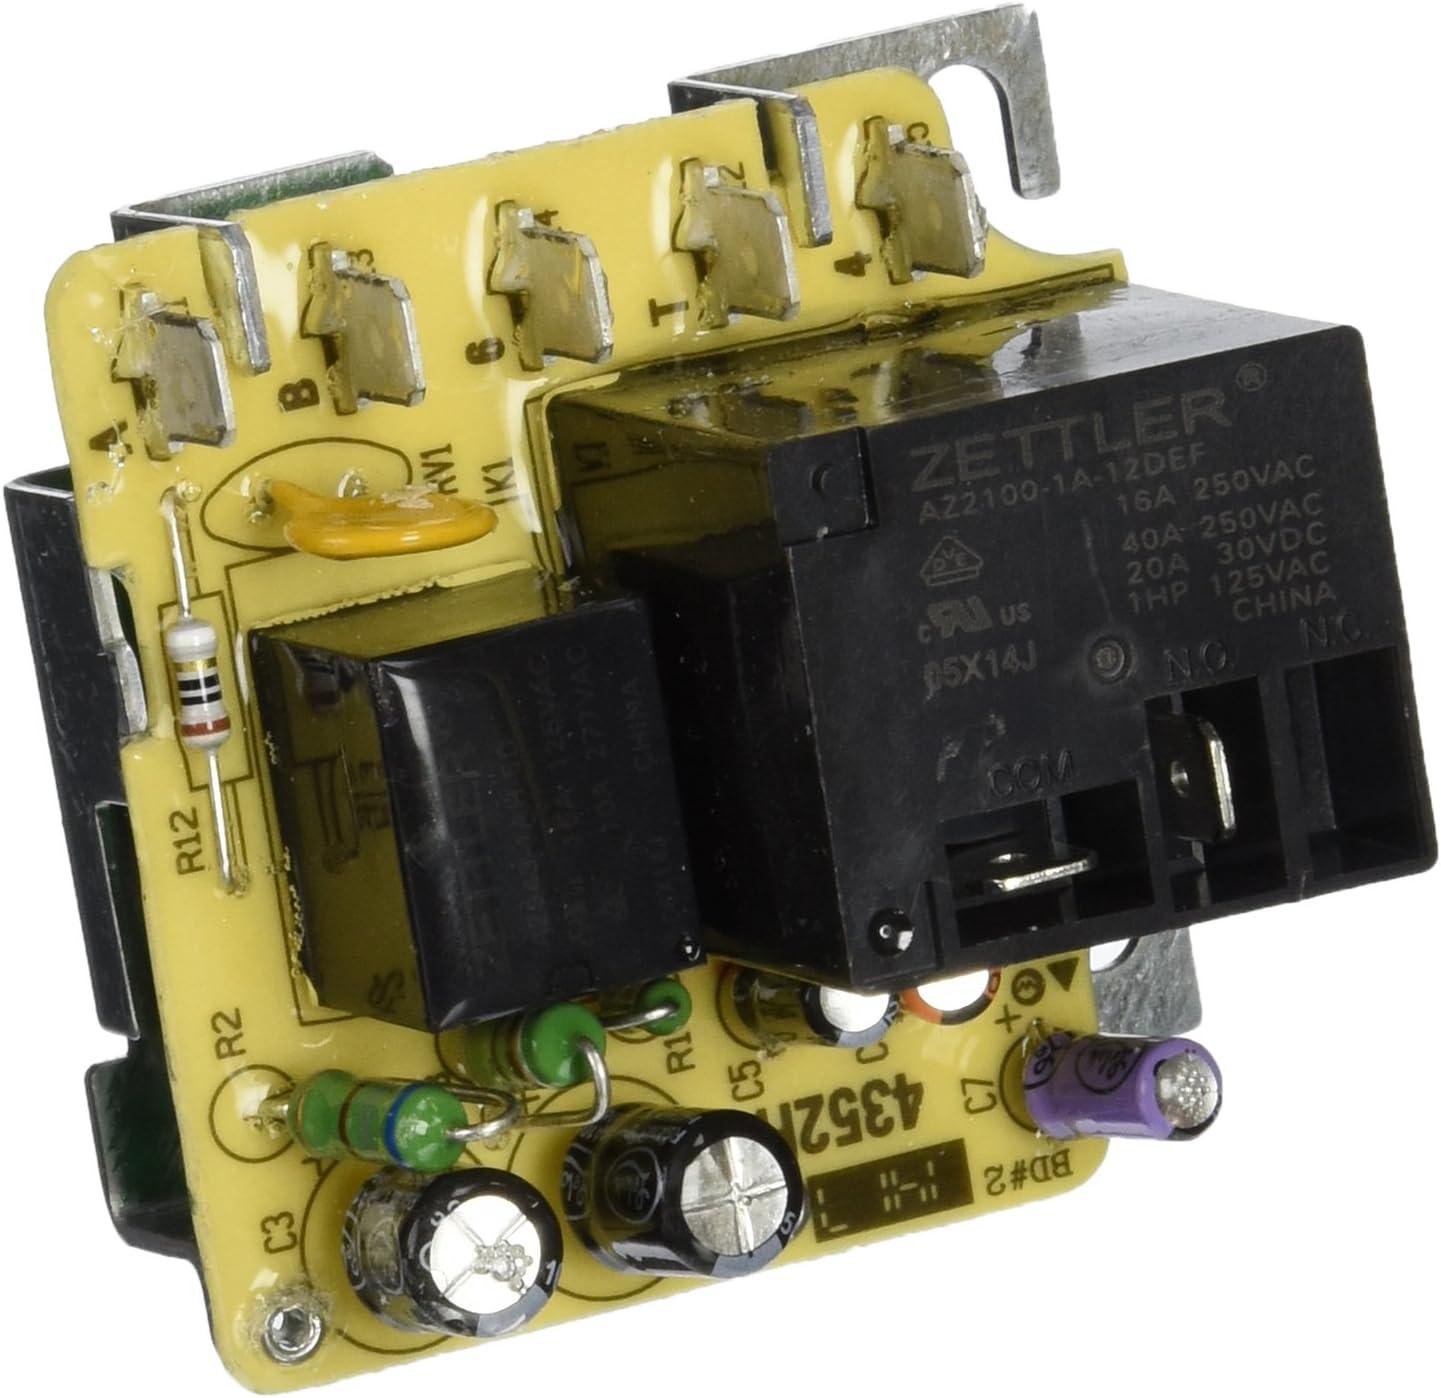 furnace fan relay wiring amazon com trane rly02807 relay switch home improvement  amazon com trane rly02807 relay switch